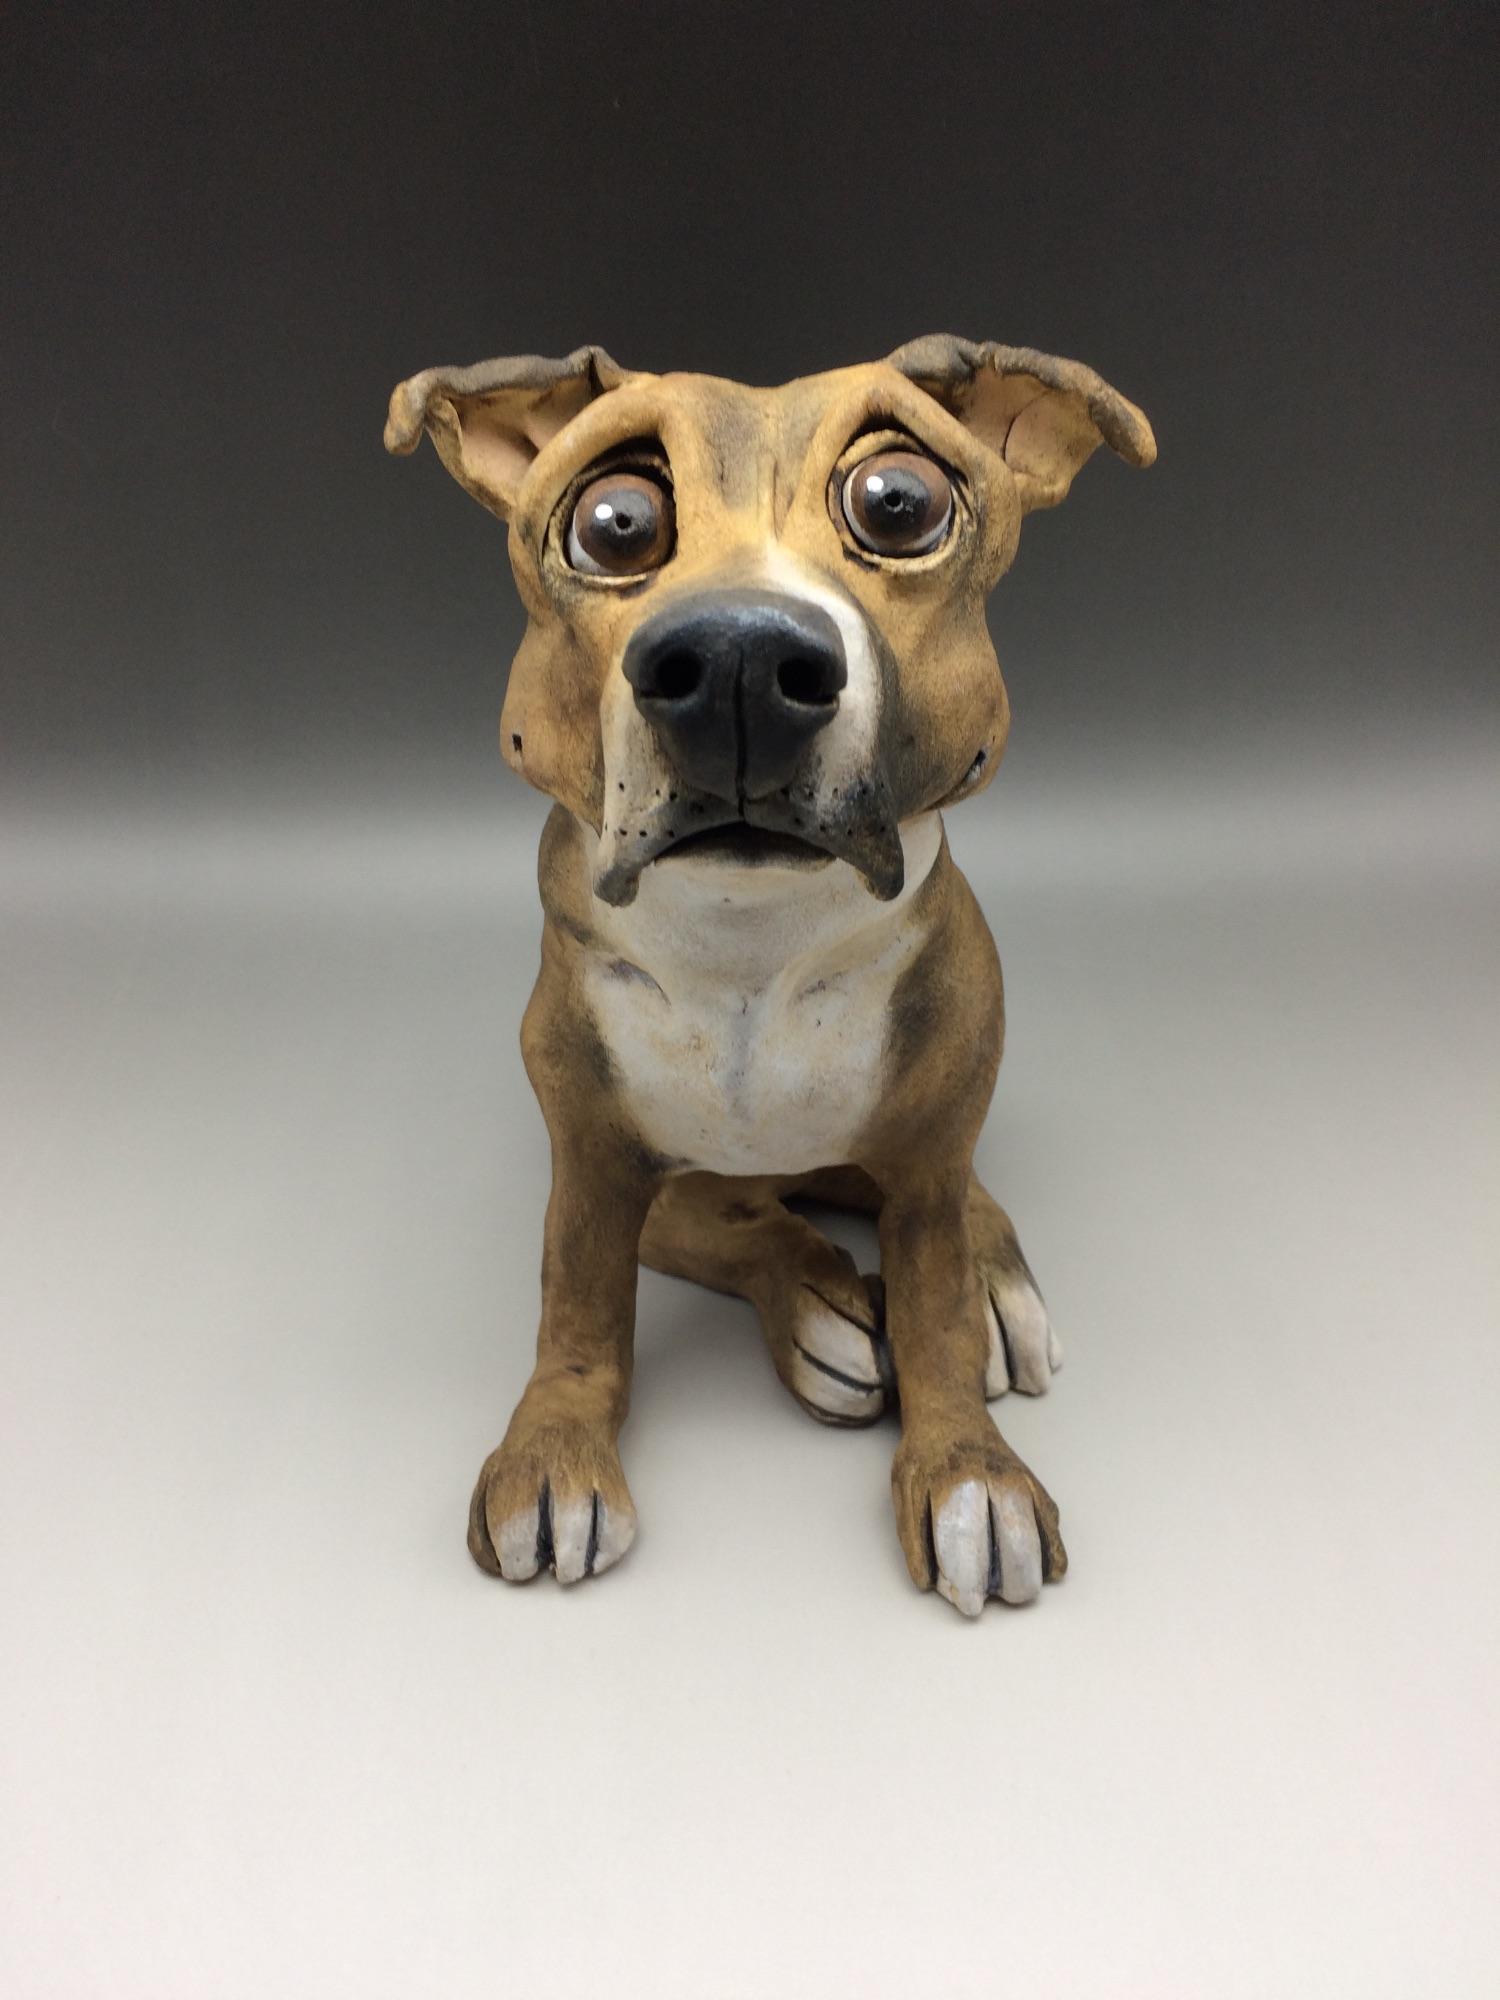 Staffordshire Bull Terrier Dog Sculpture Ceramic